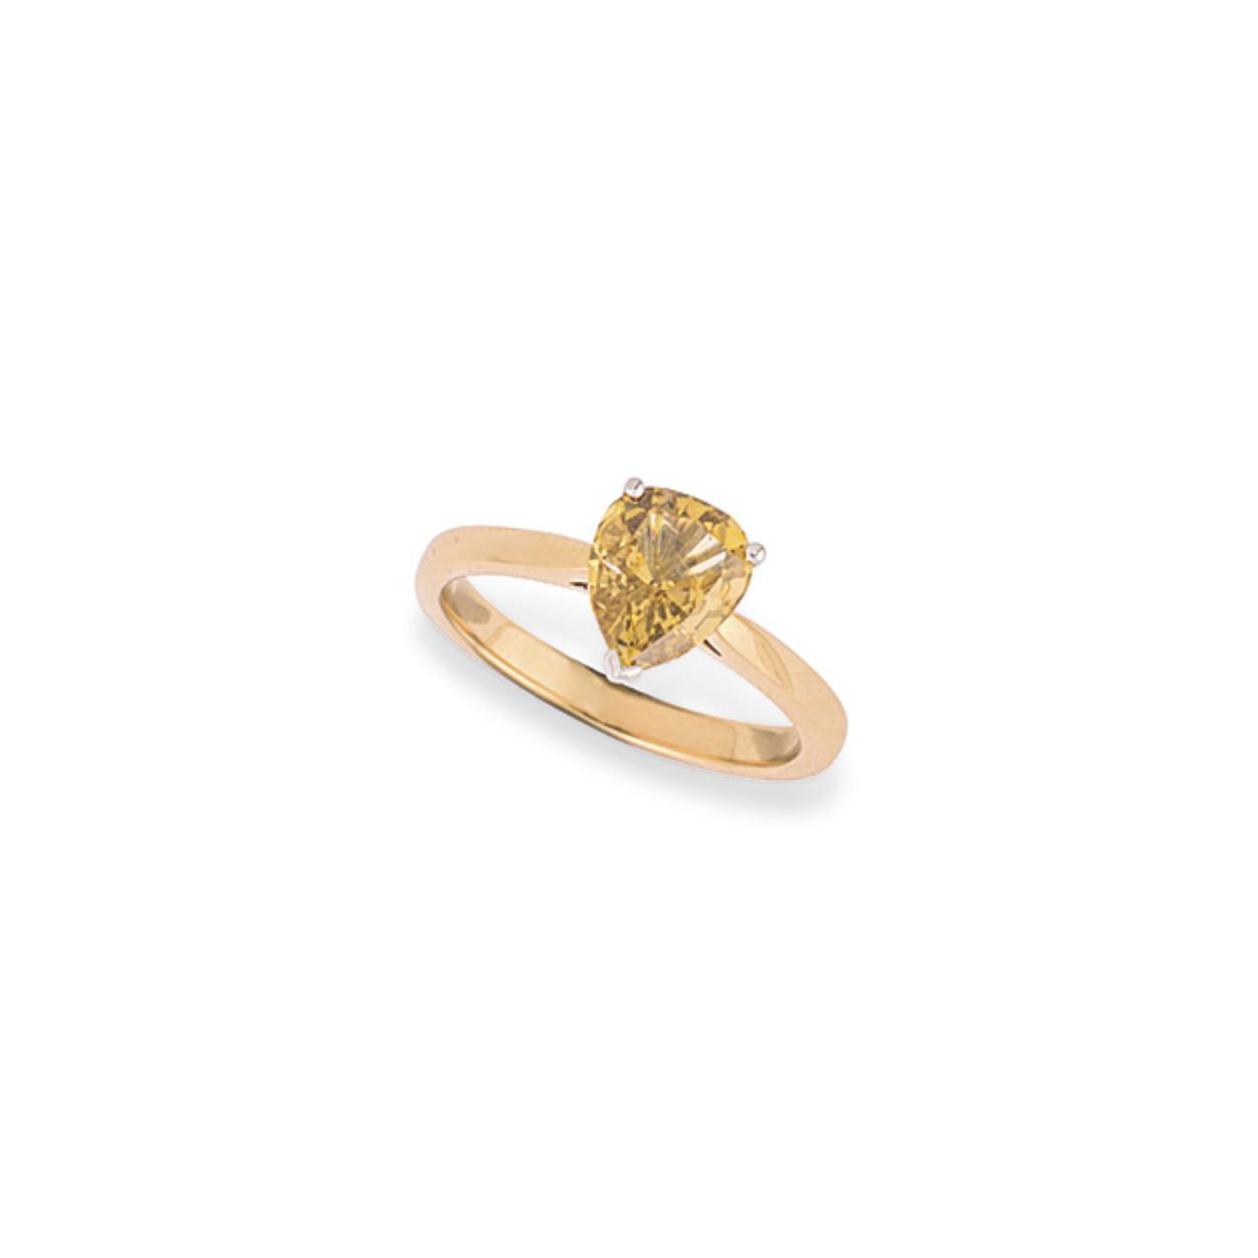 A COLOURED DIAMOND SINGLE STON